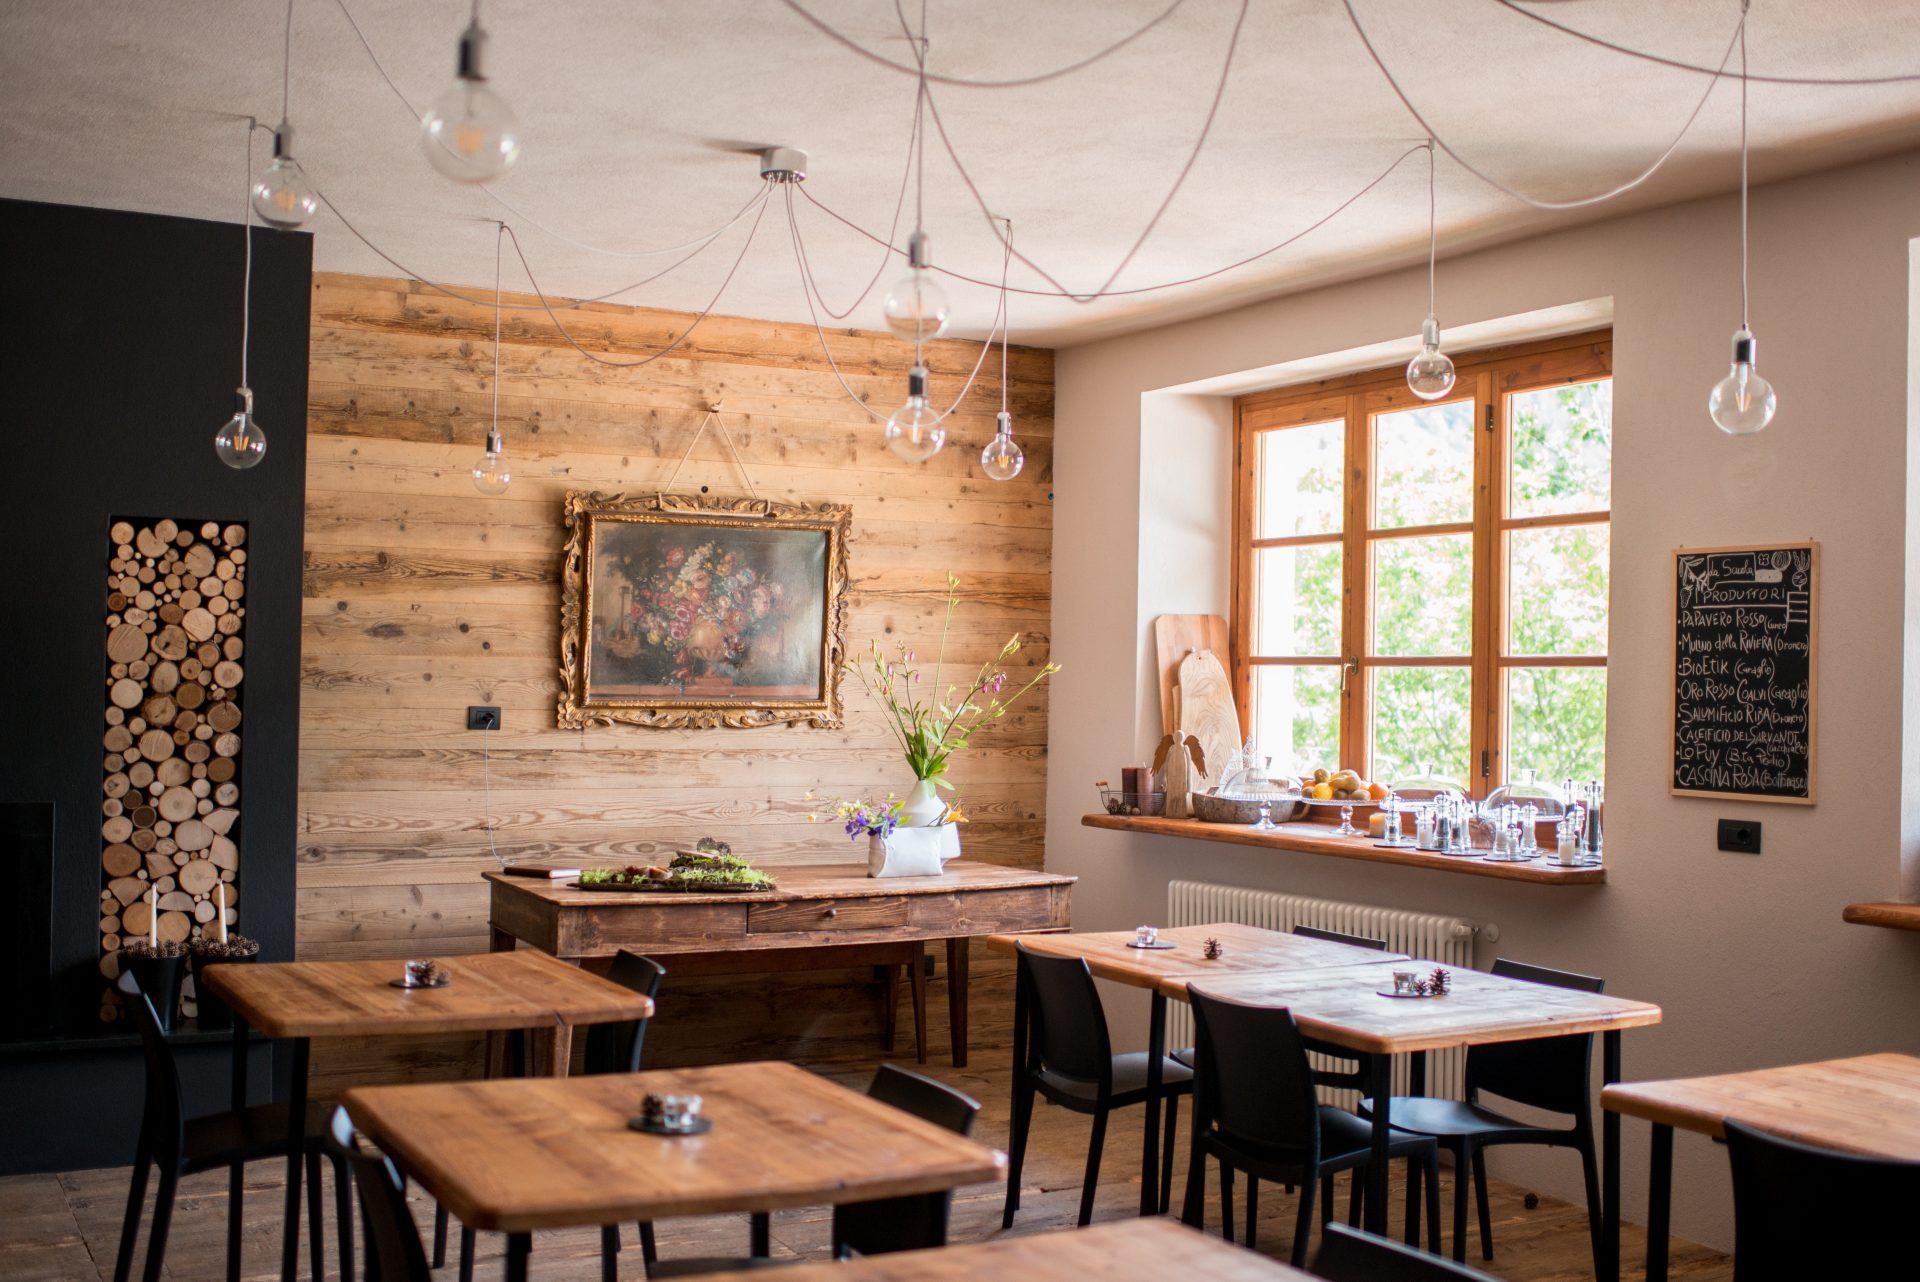 dreveny-nabytok-interierovy-dizajn-stoly-stolicky-restauracia